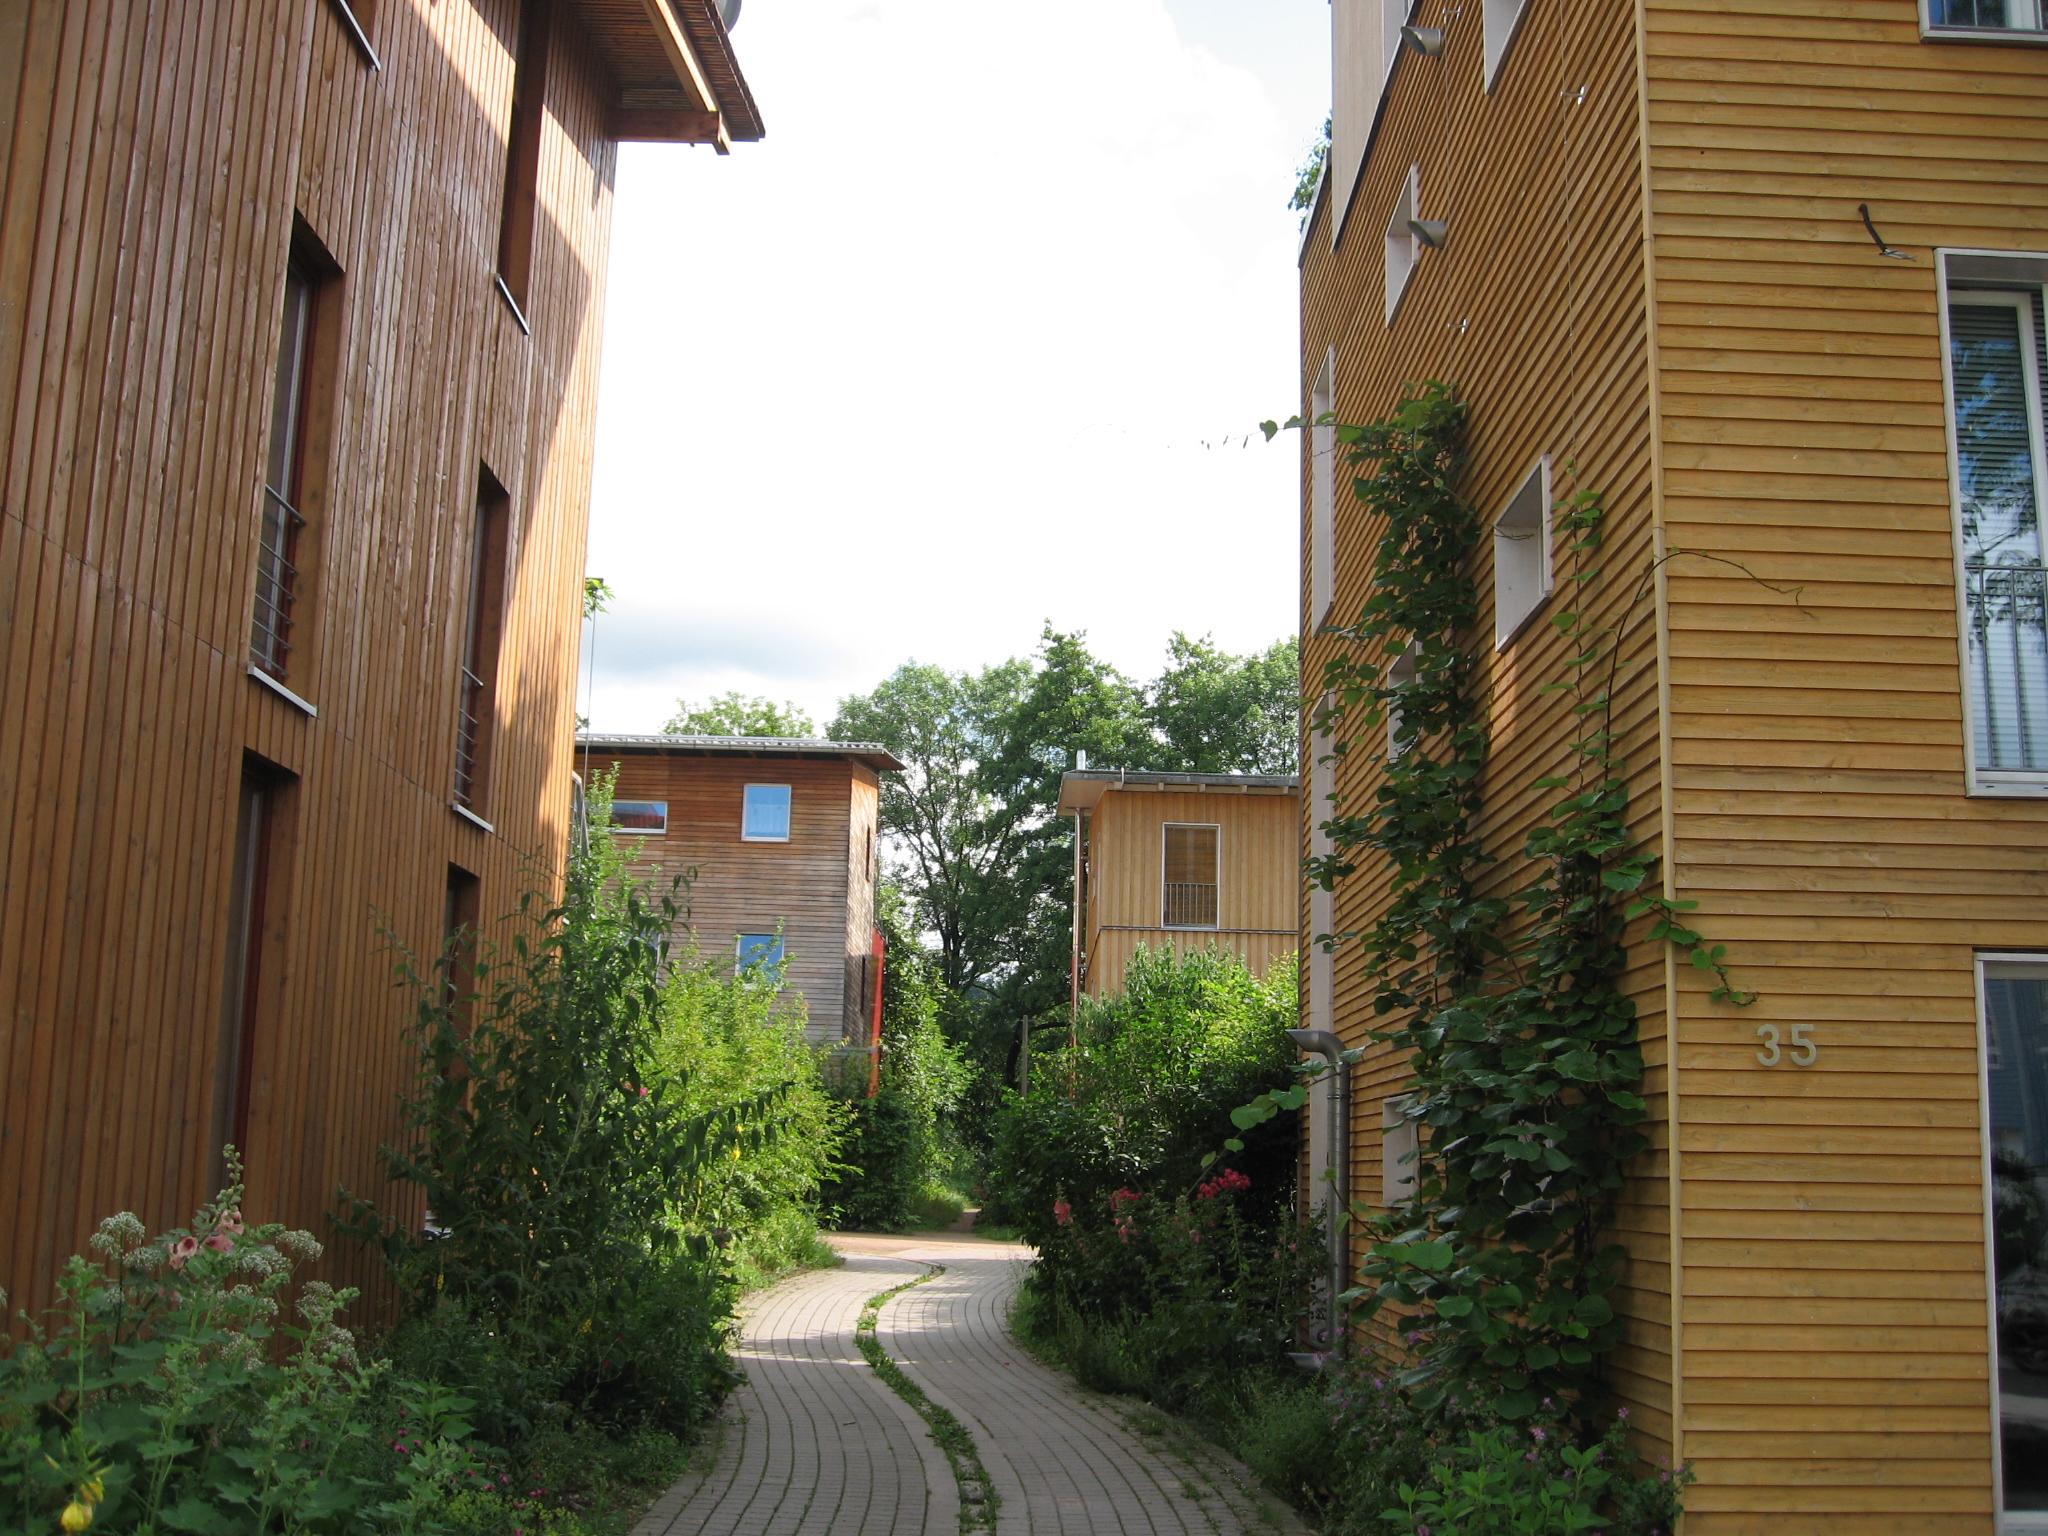 http://en.wikipedia.org/wiki/File:Ecoquartier_Vauban_Freibourg3.JPG